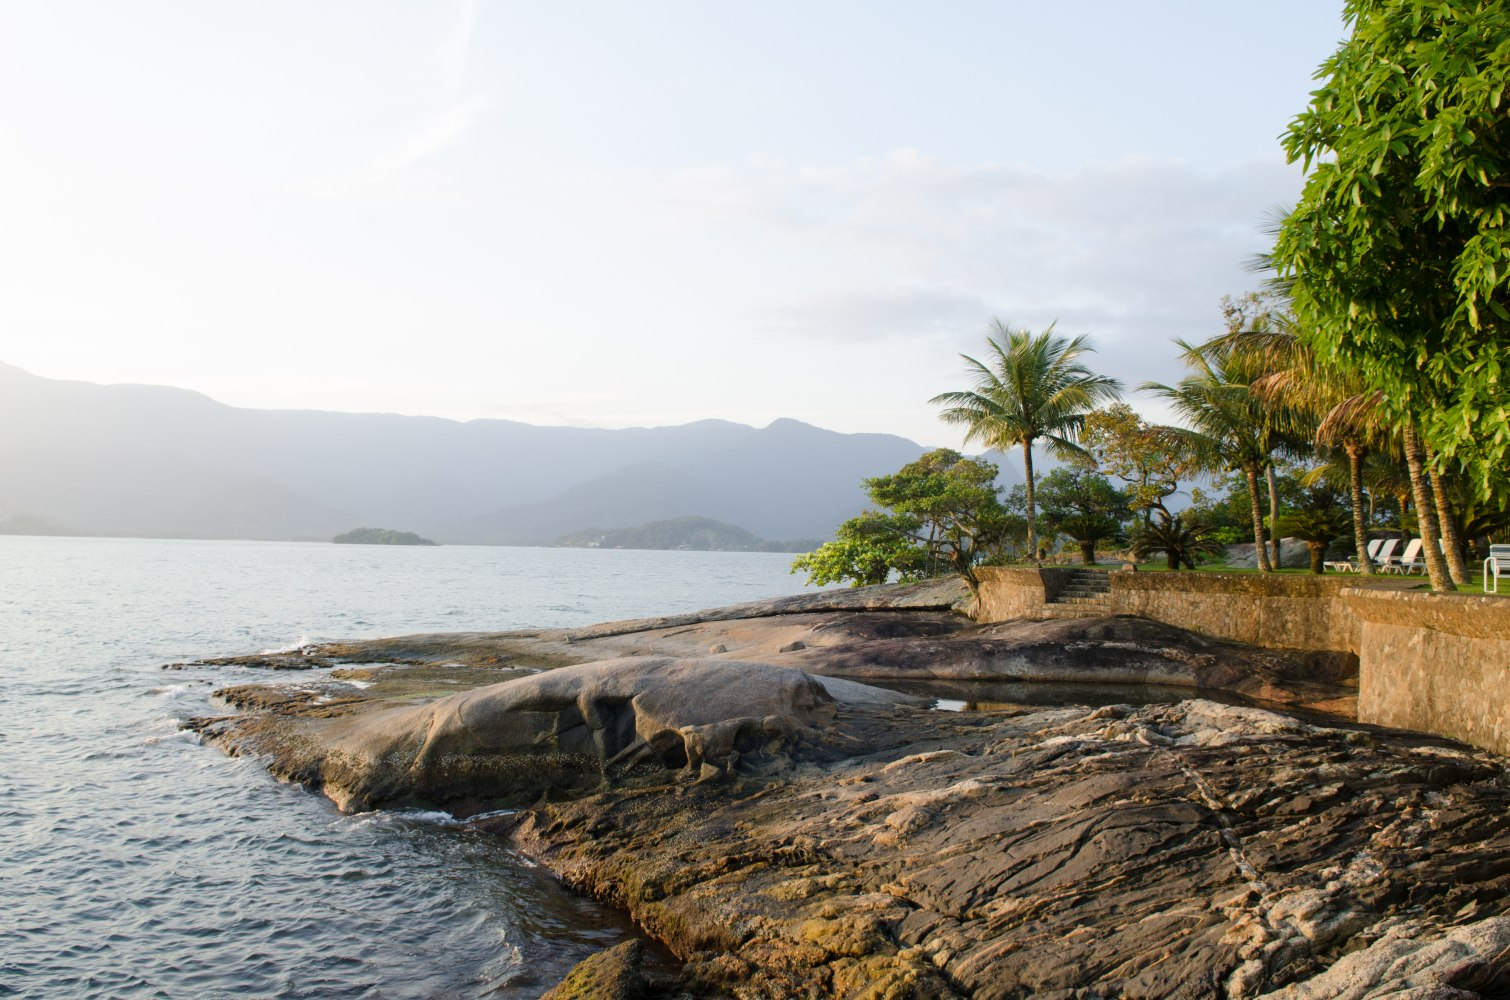 Islands For Sale Ina Merica